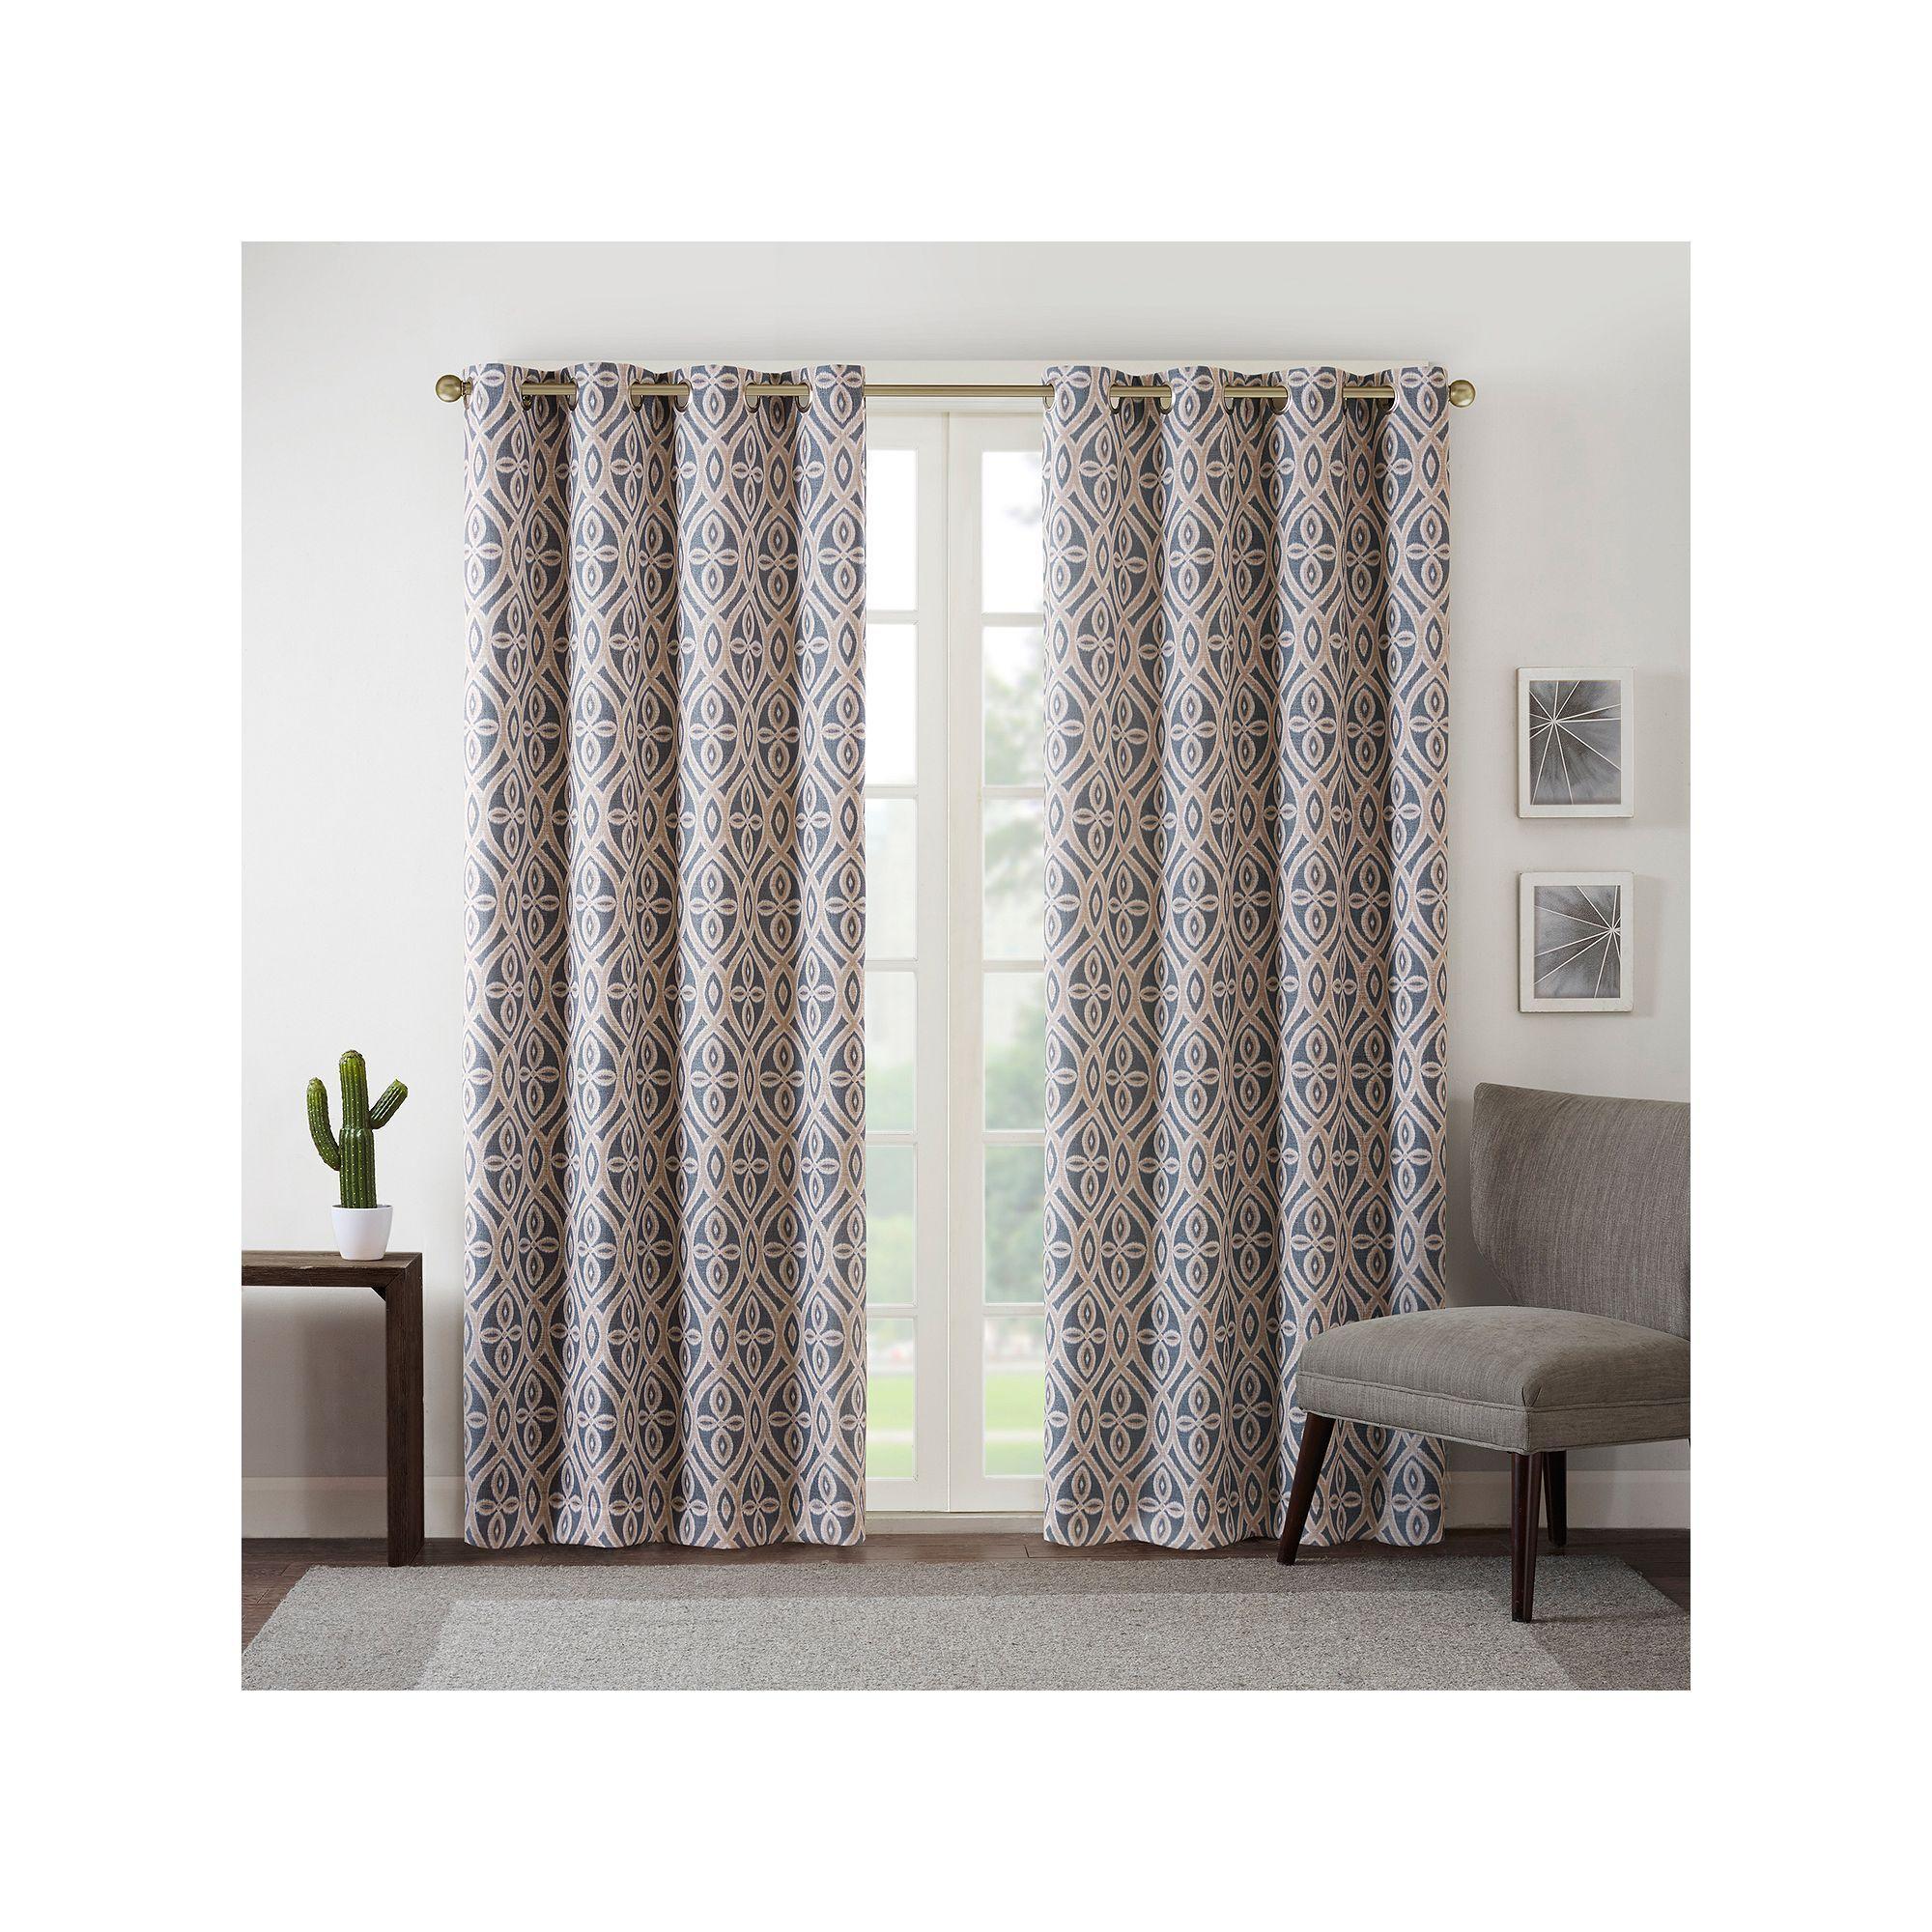 Intelligent Design Arlo Blackout Curtain Grey